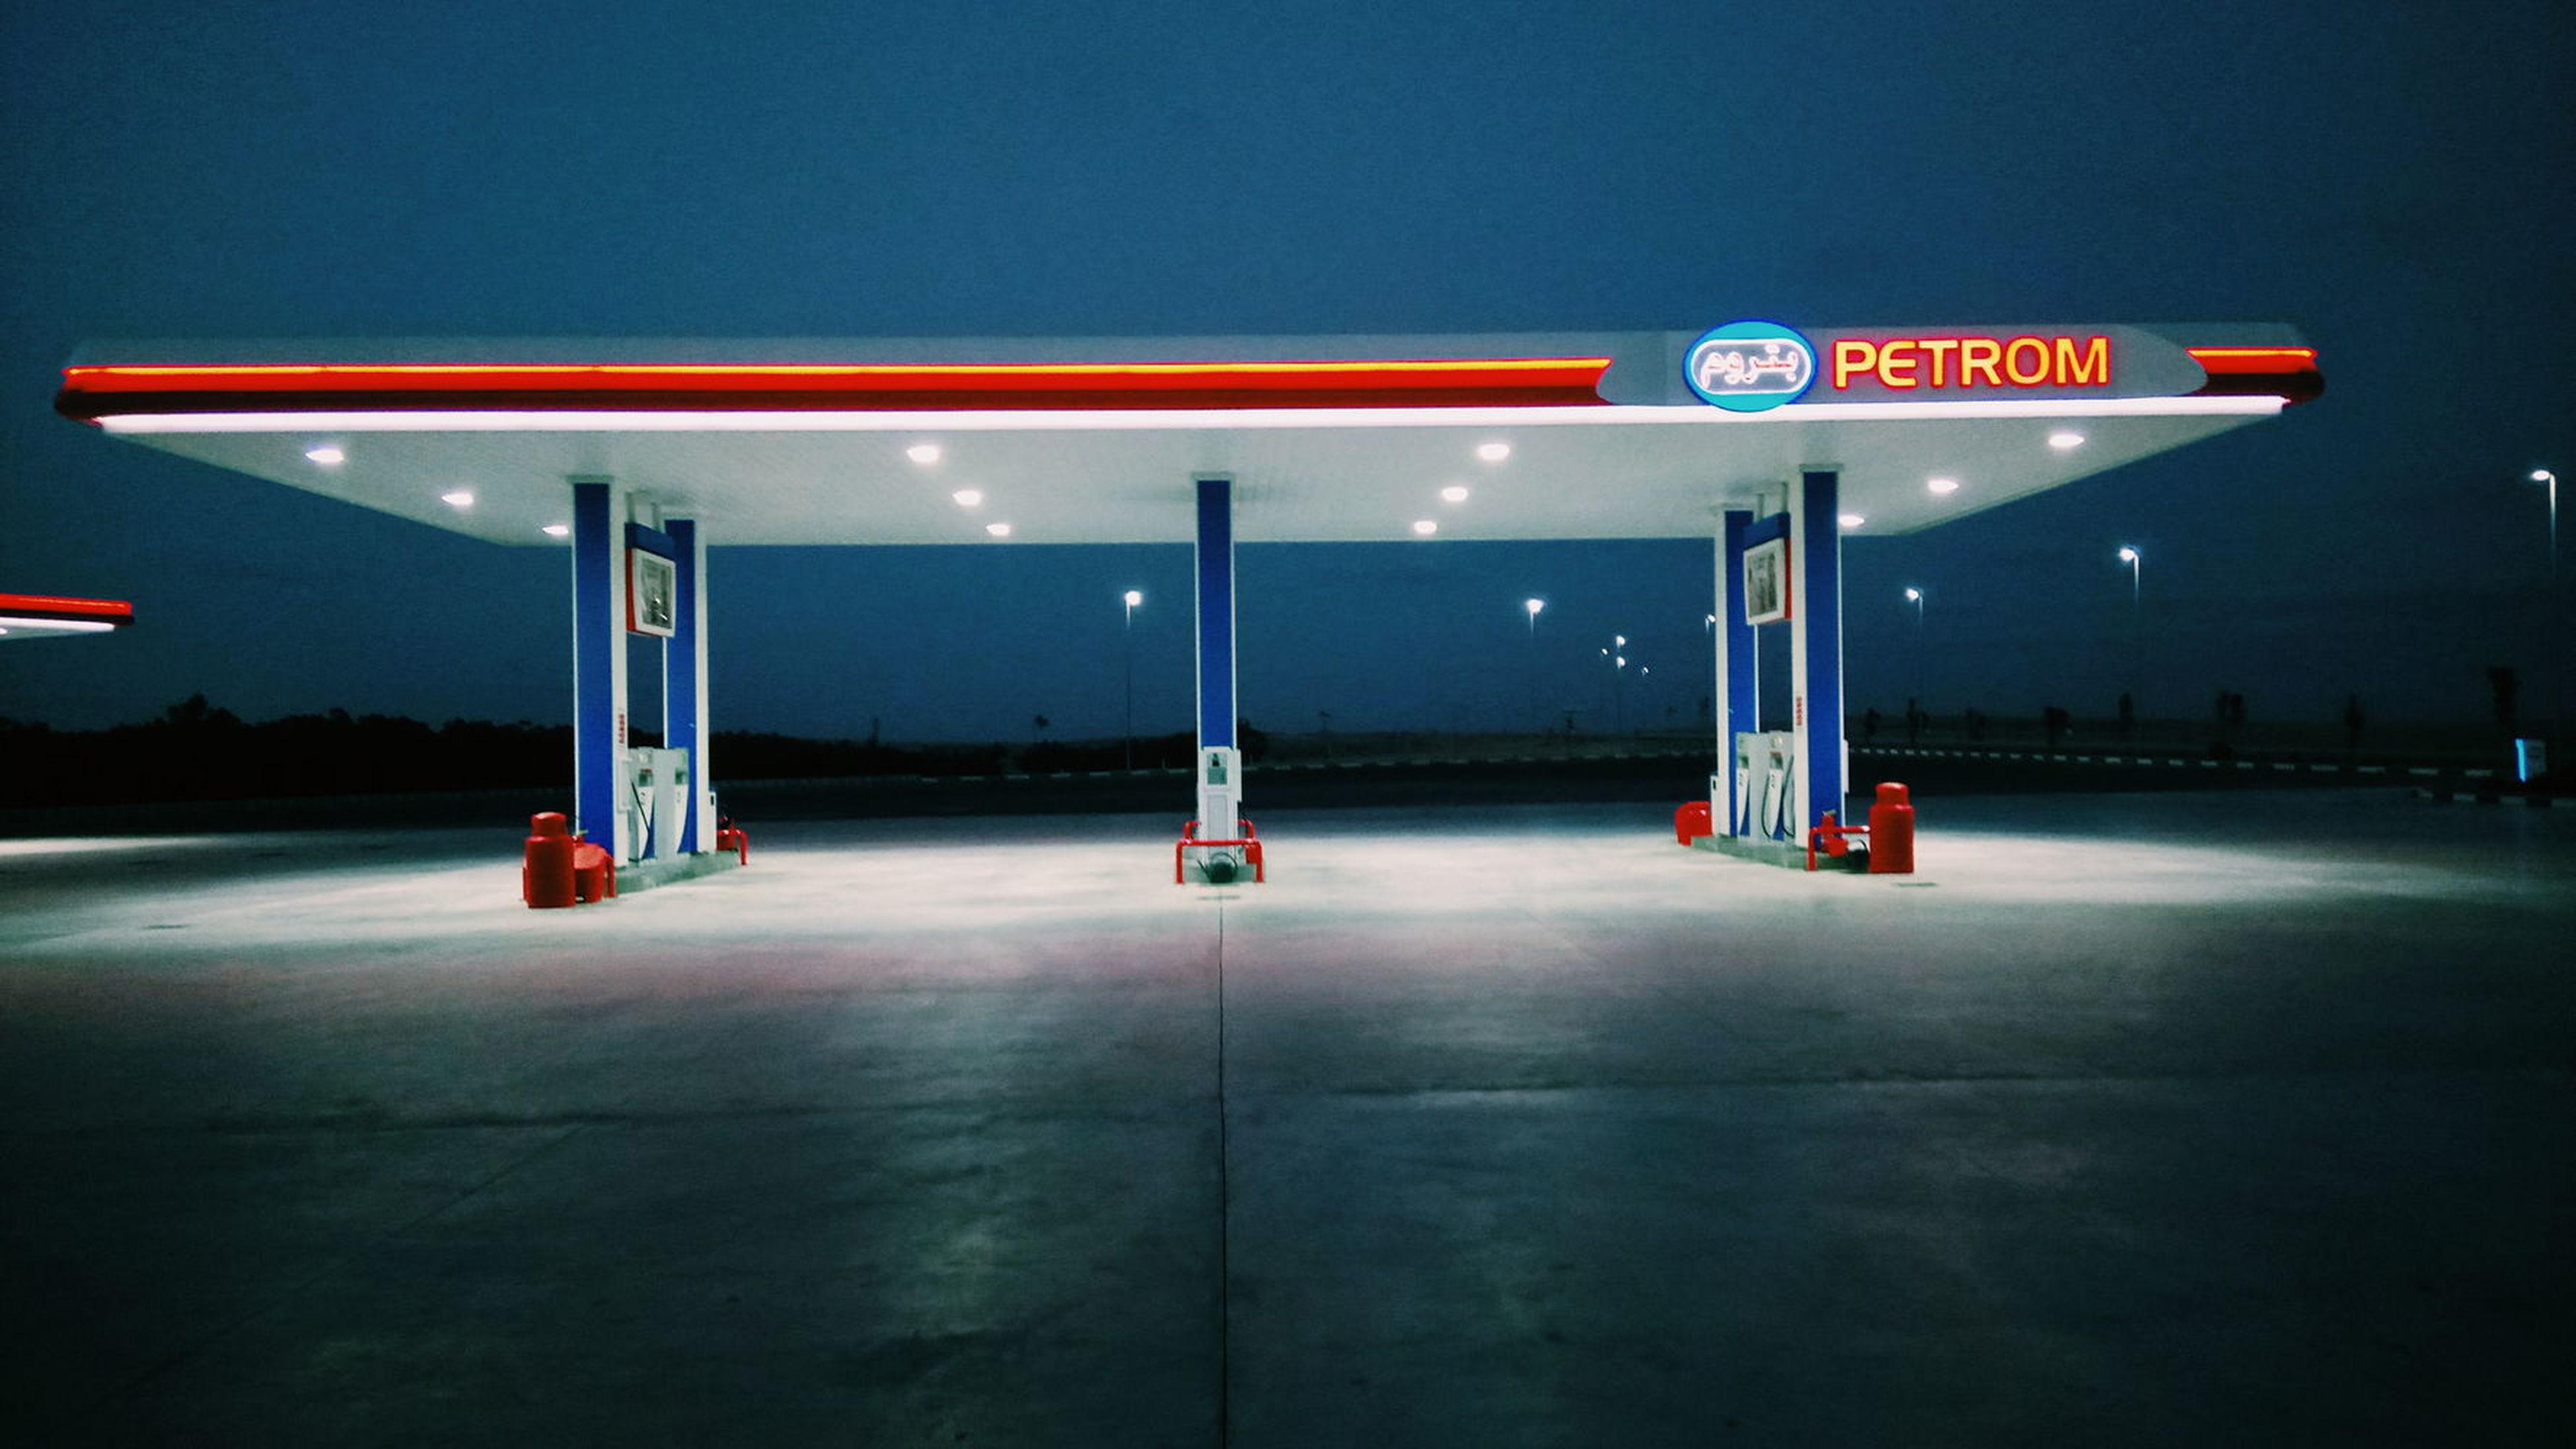 communication, gas station, text, night, illuminated, transportation, no people, fuel pump, refueling, road, outdoors